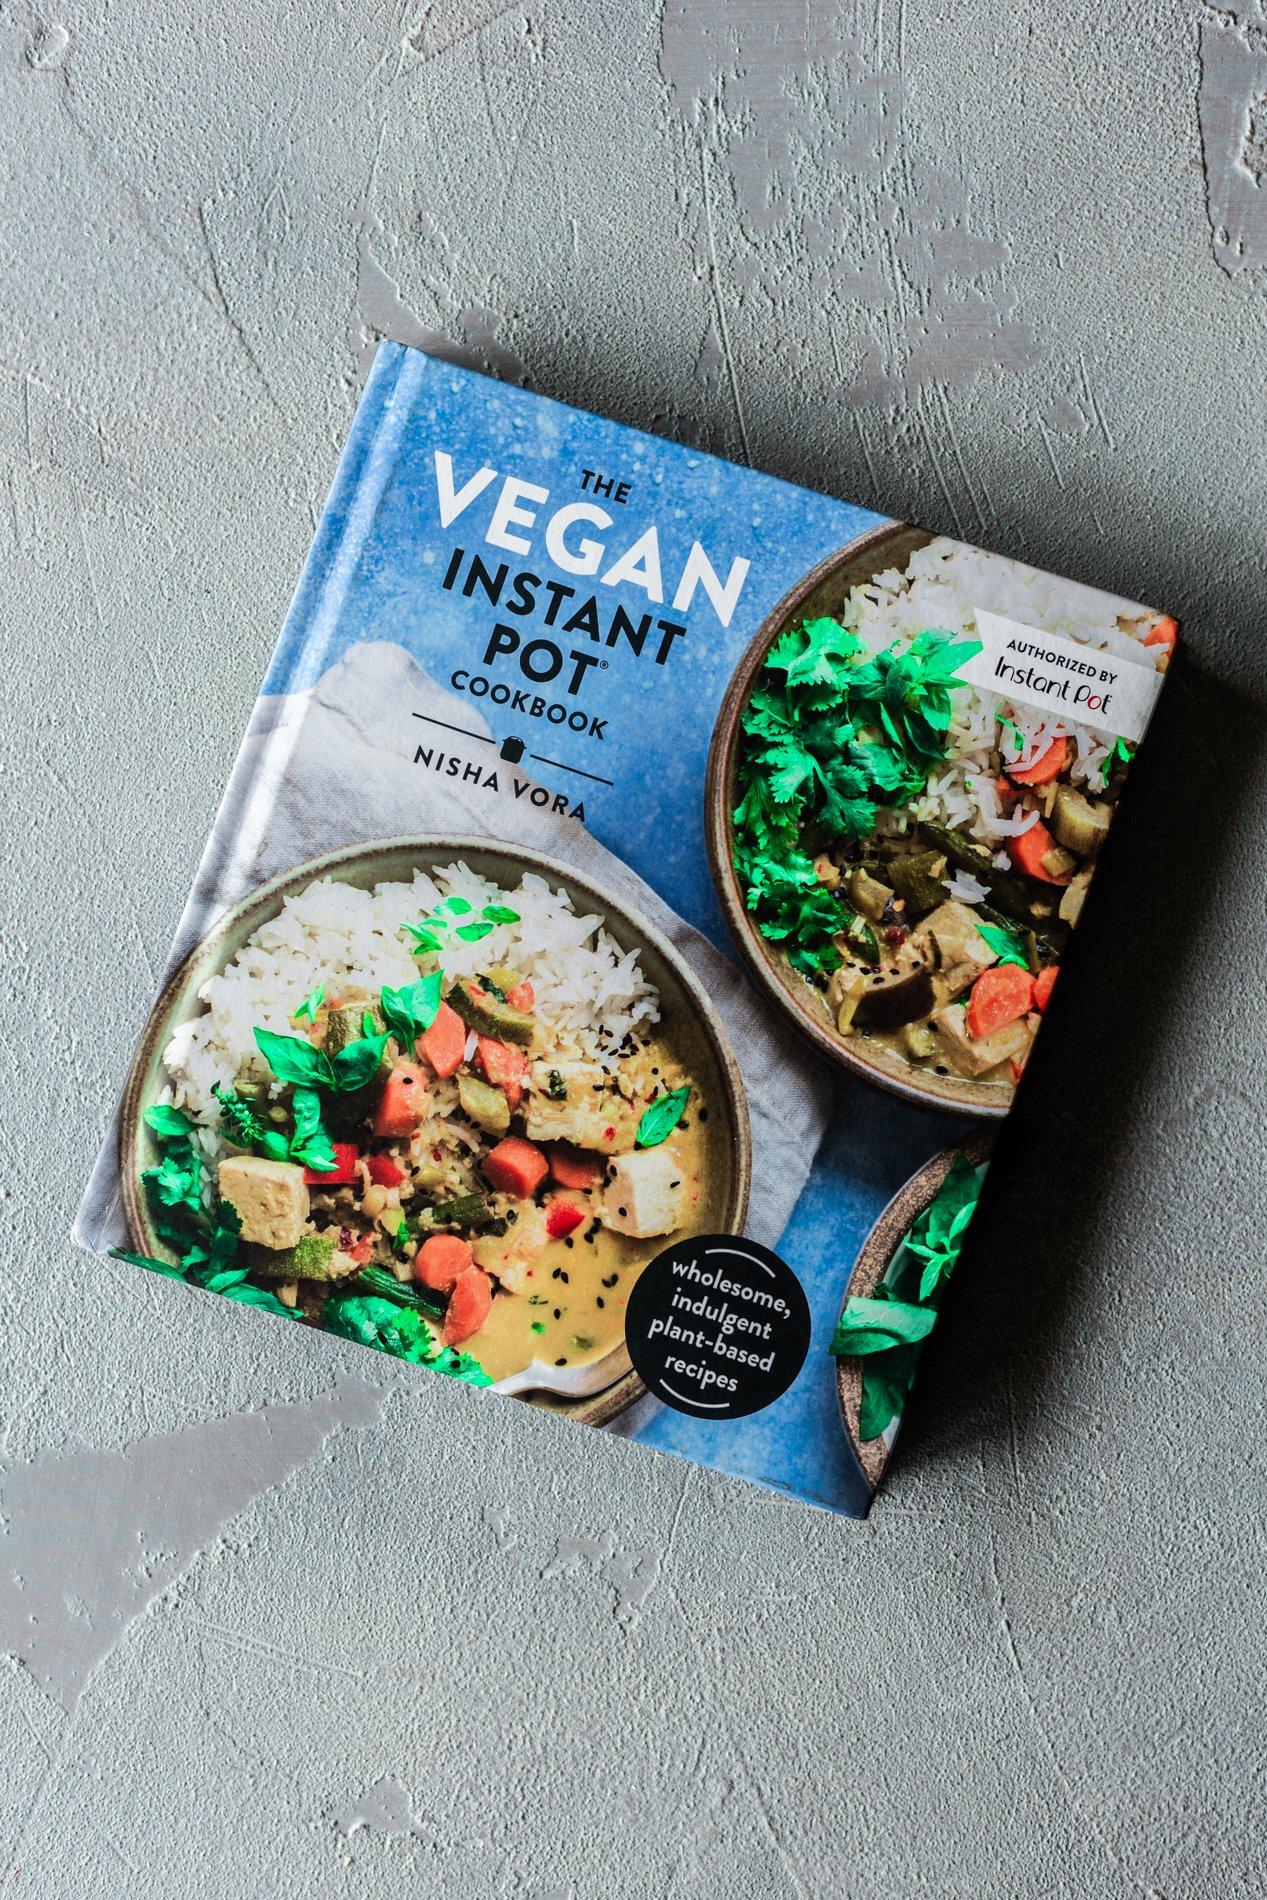 overhead view of the vegan instant pot cookbook by nisha vora